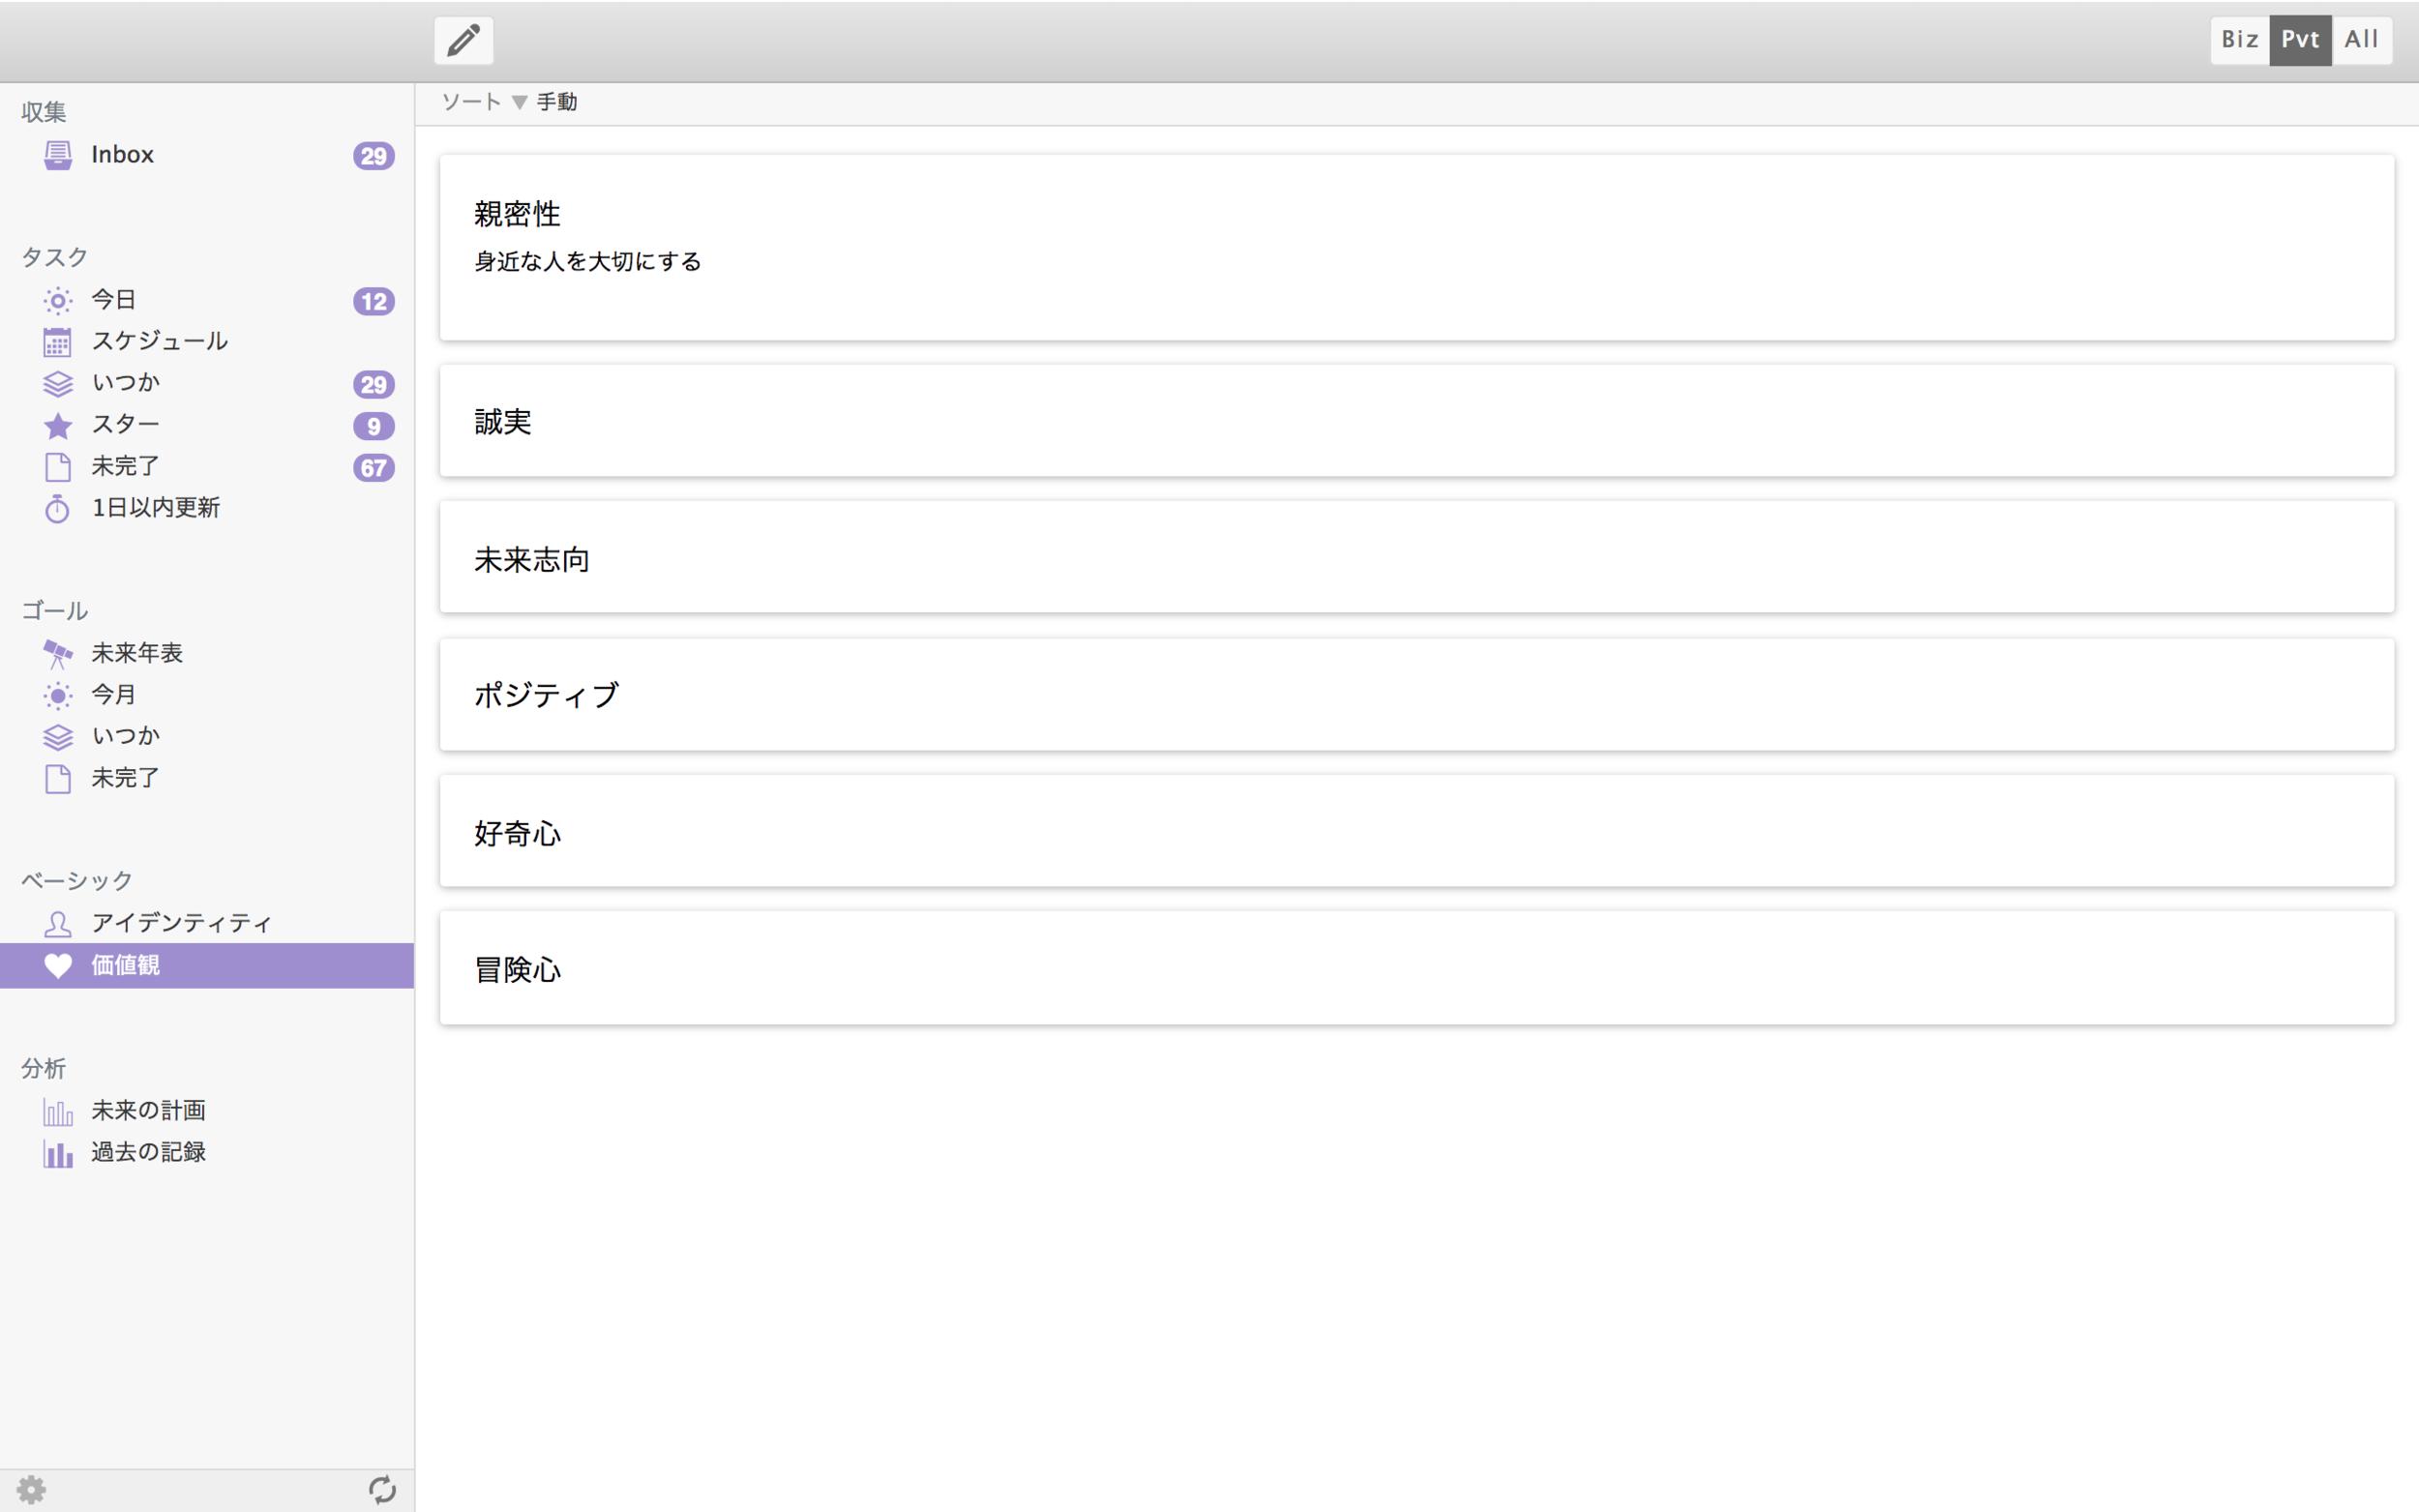 web-value.png